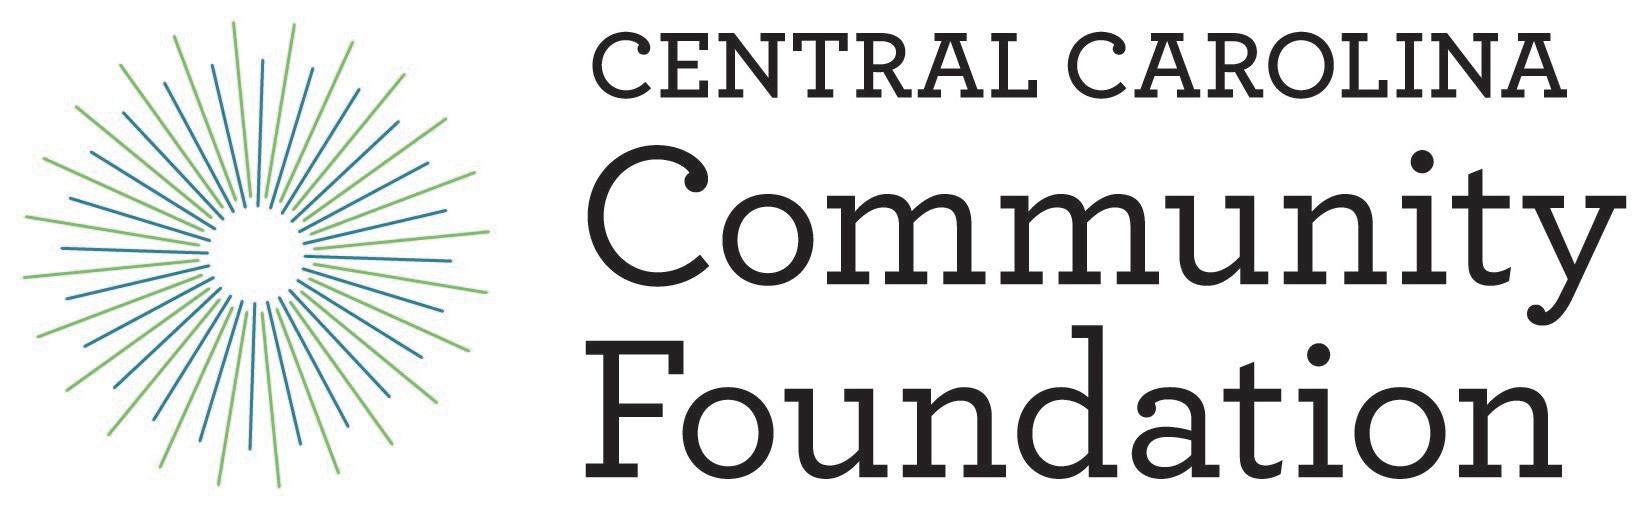 central_carolina_community_foundation_lo